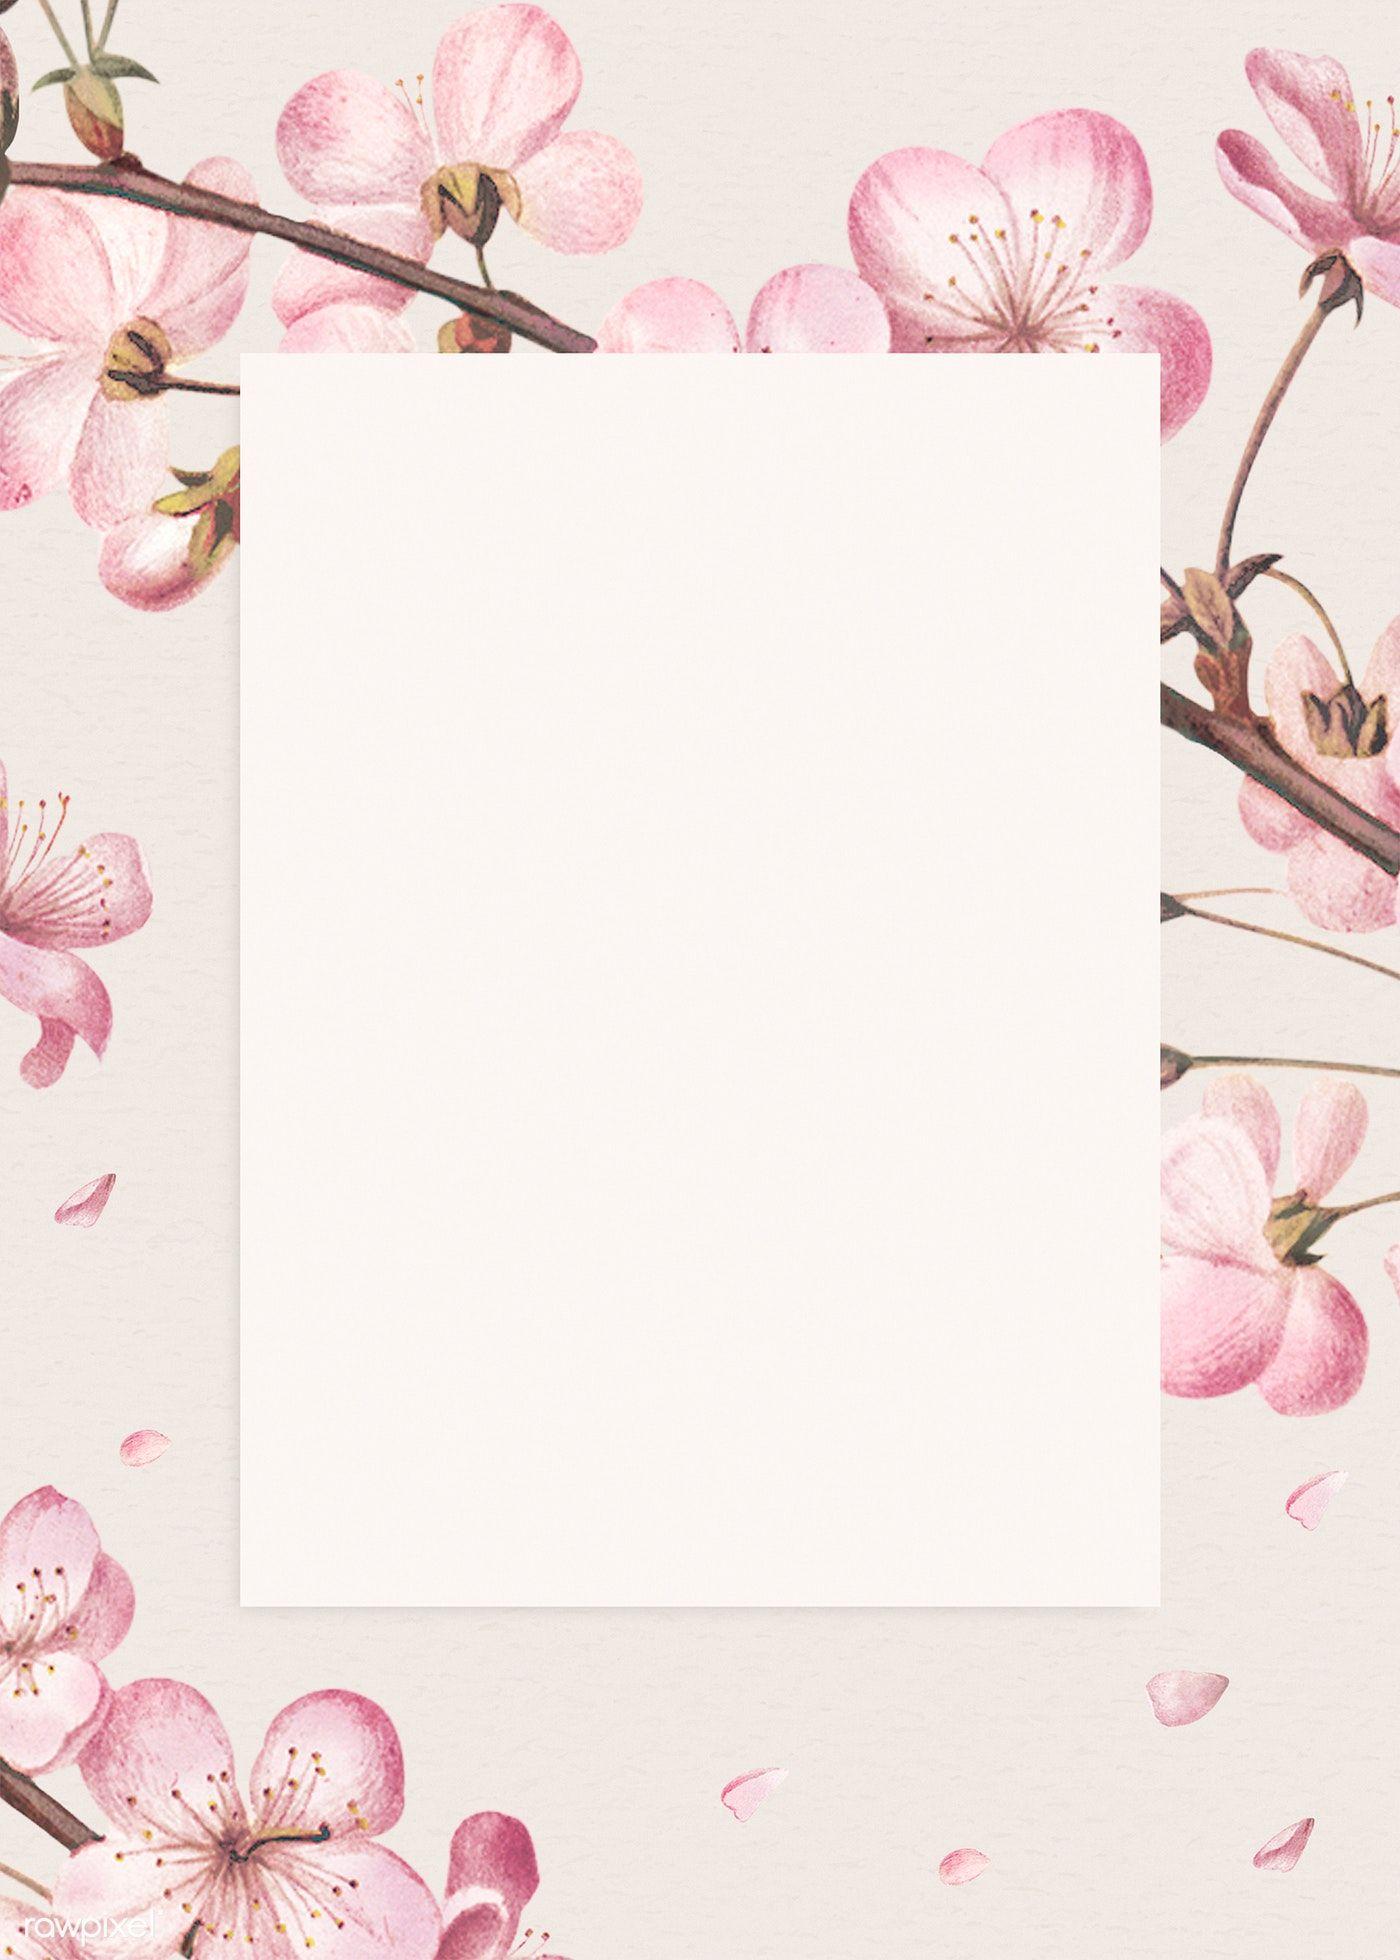 Download premium illustration of Blank pink floral card